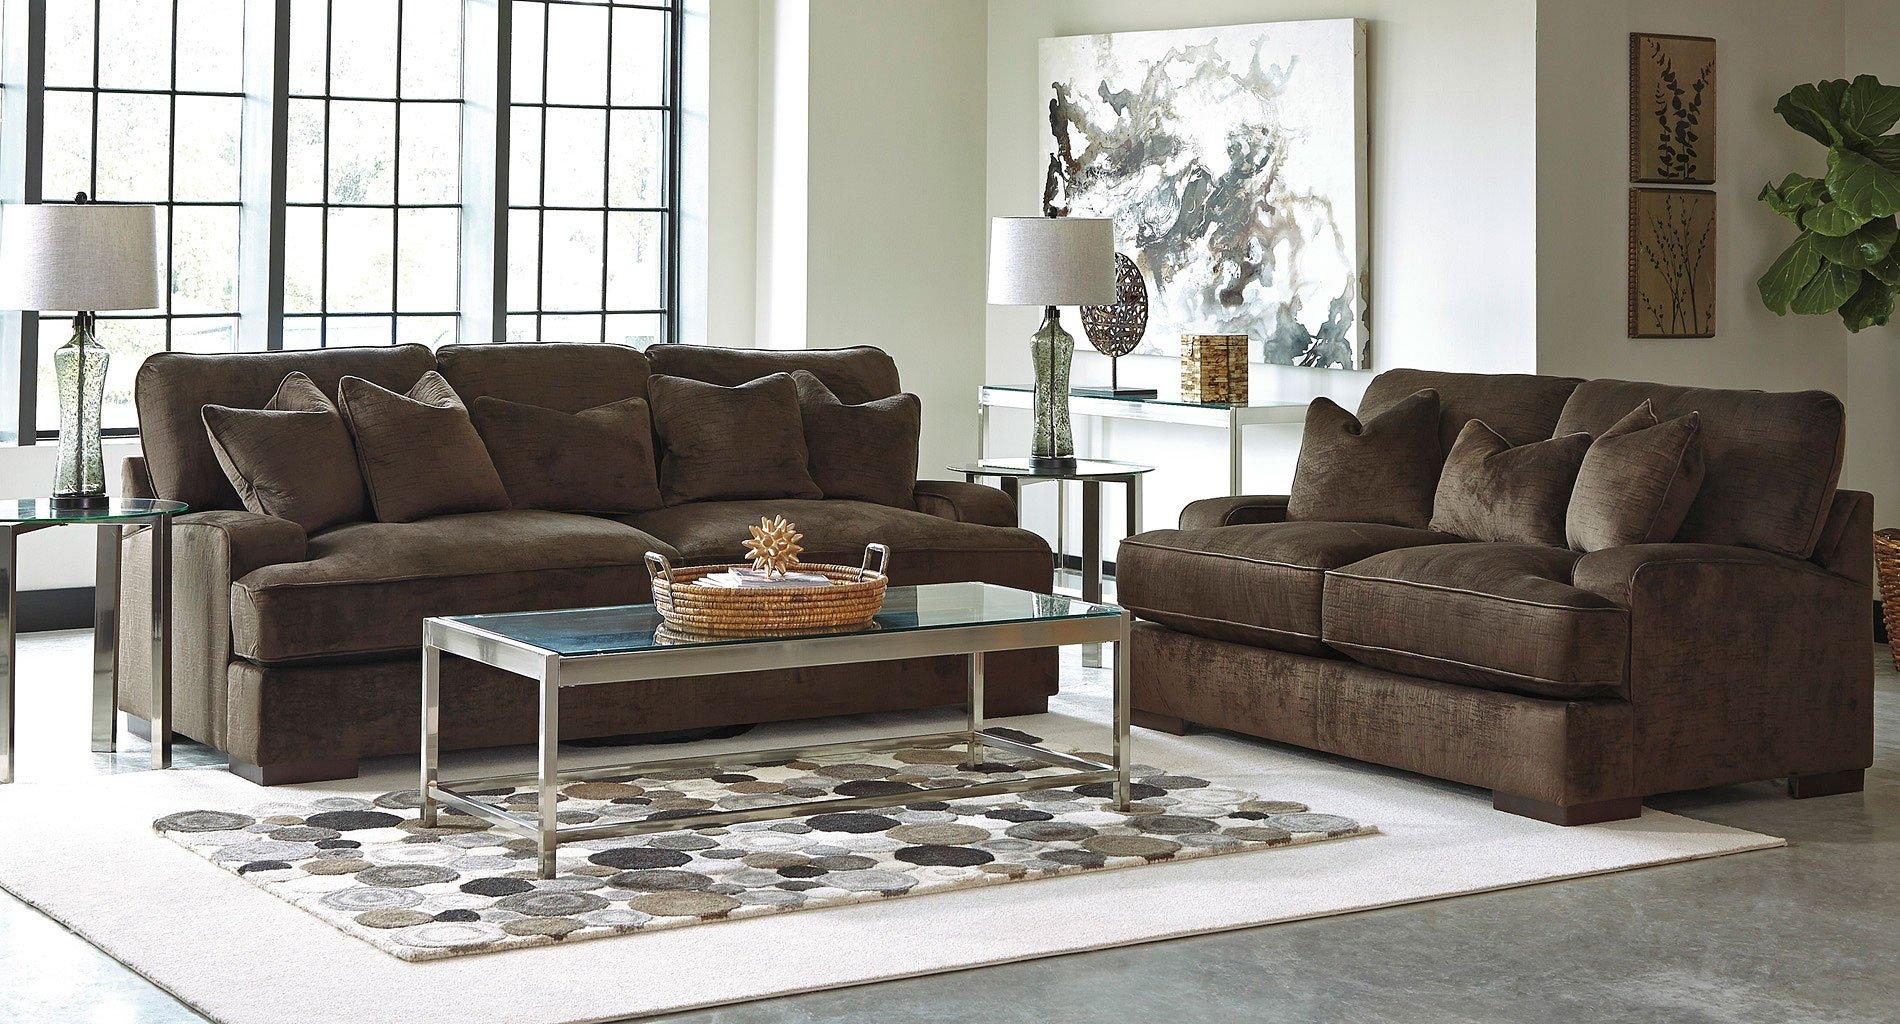 bisenti chocolate living room set benchcraft furniture cart rh furniturecart com chocolate brown living room set vacherie chocolate reclining living room set